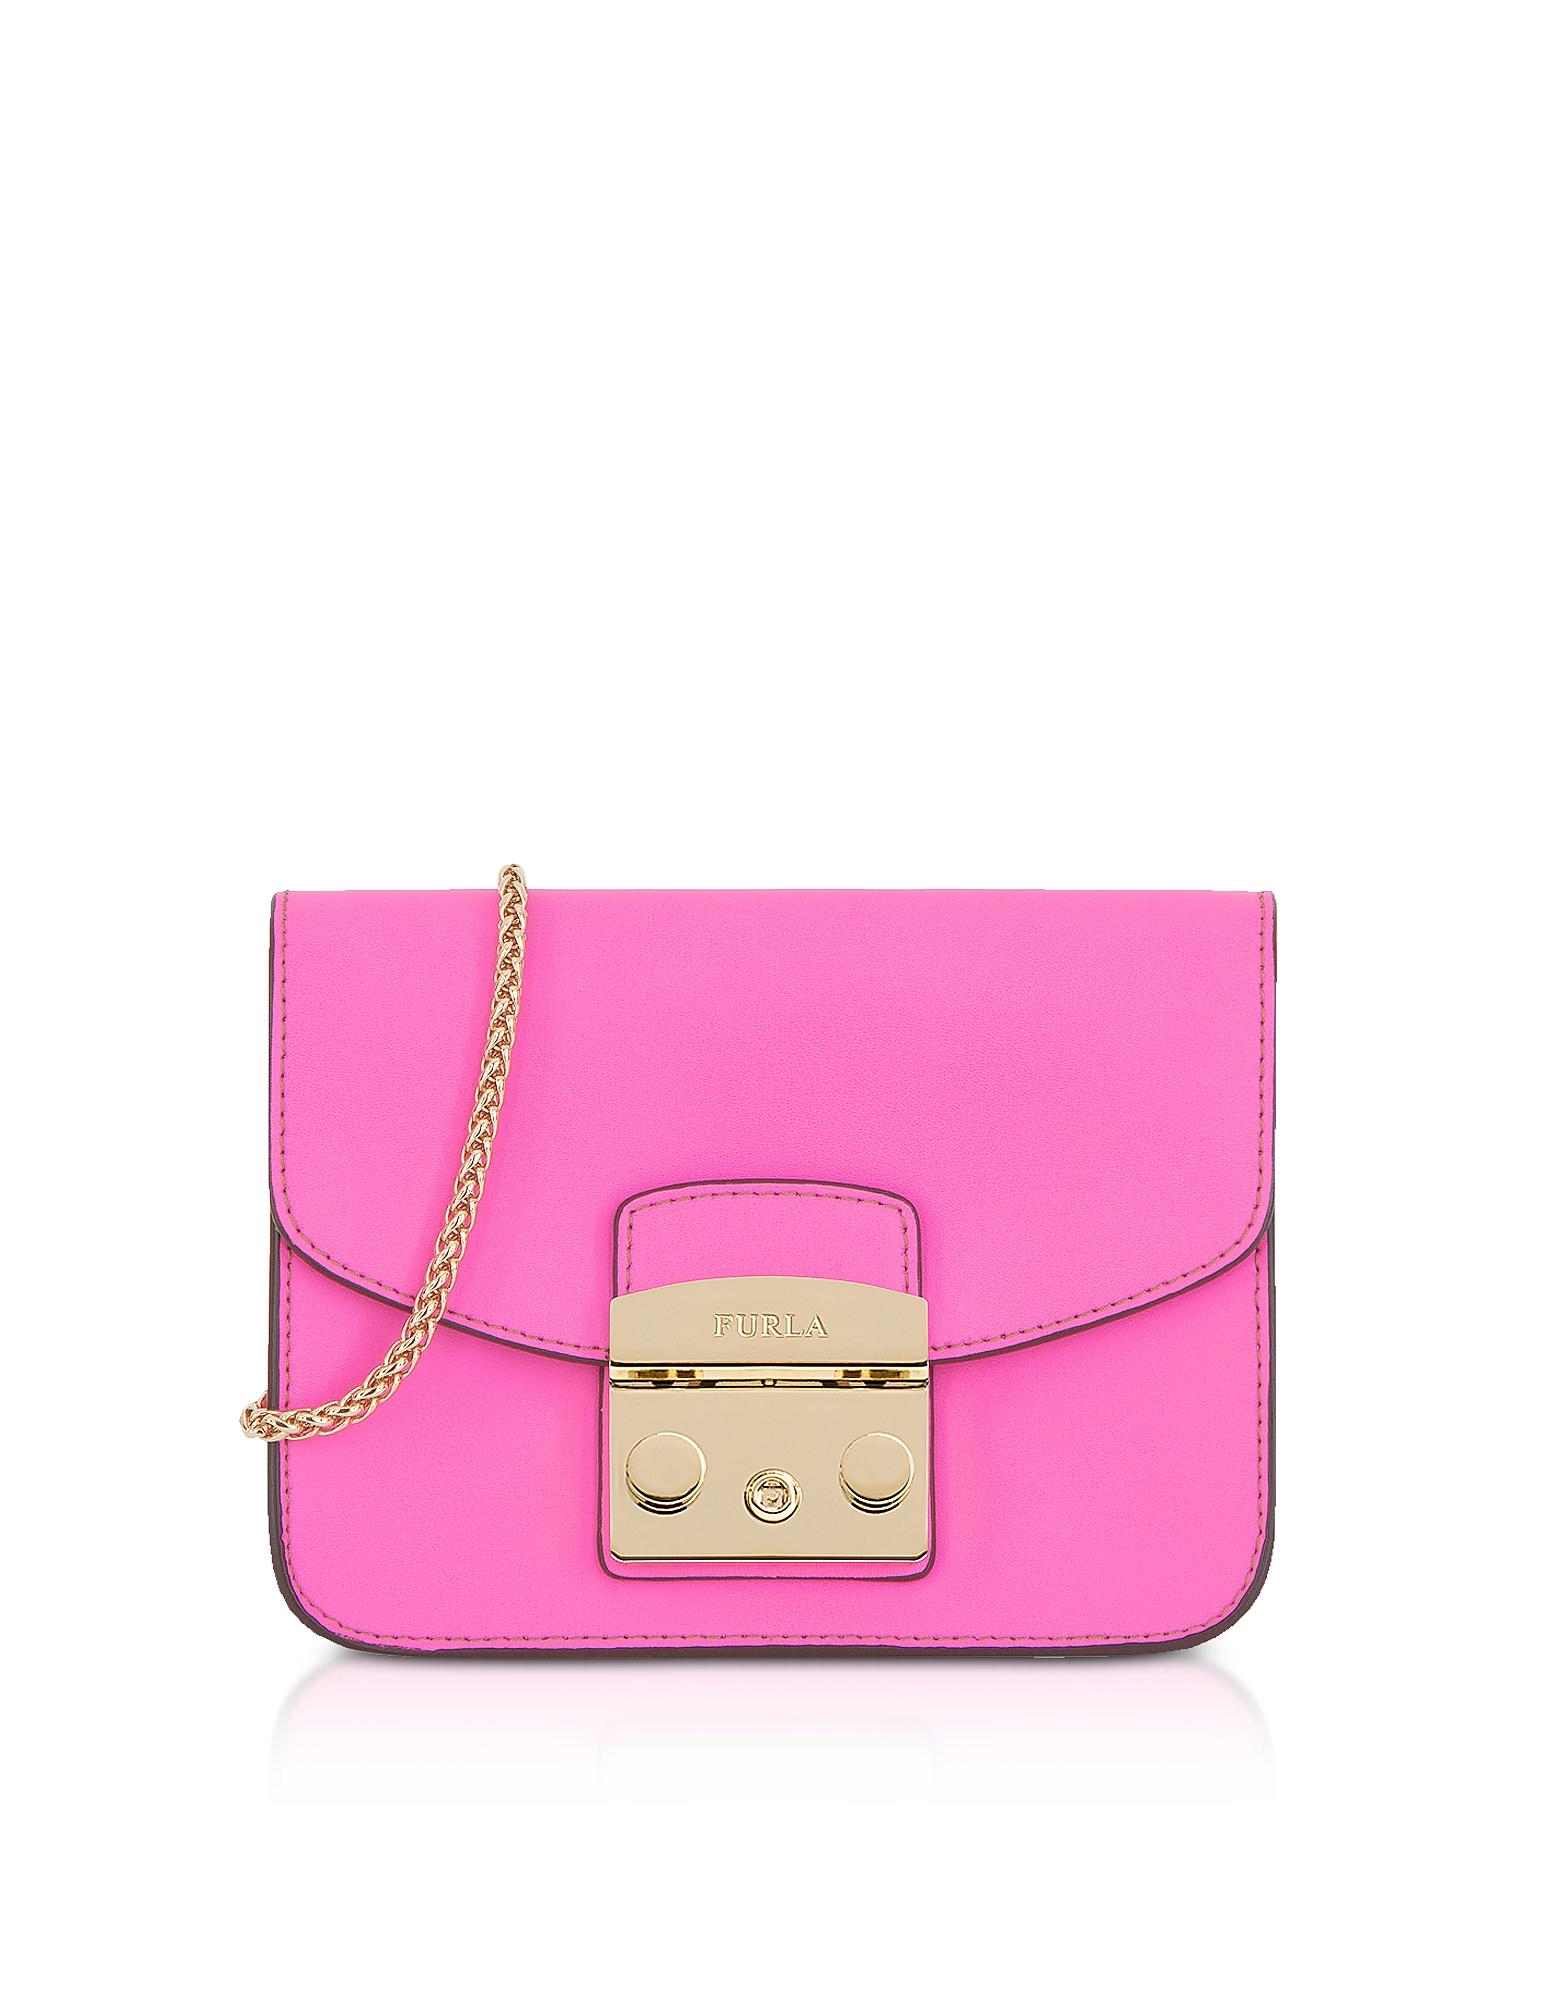 Furla Handbags, Fuchsia Leather Metropolis Mini Crossbody Bag